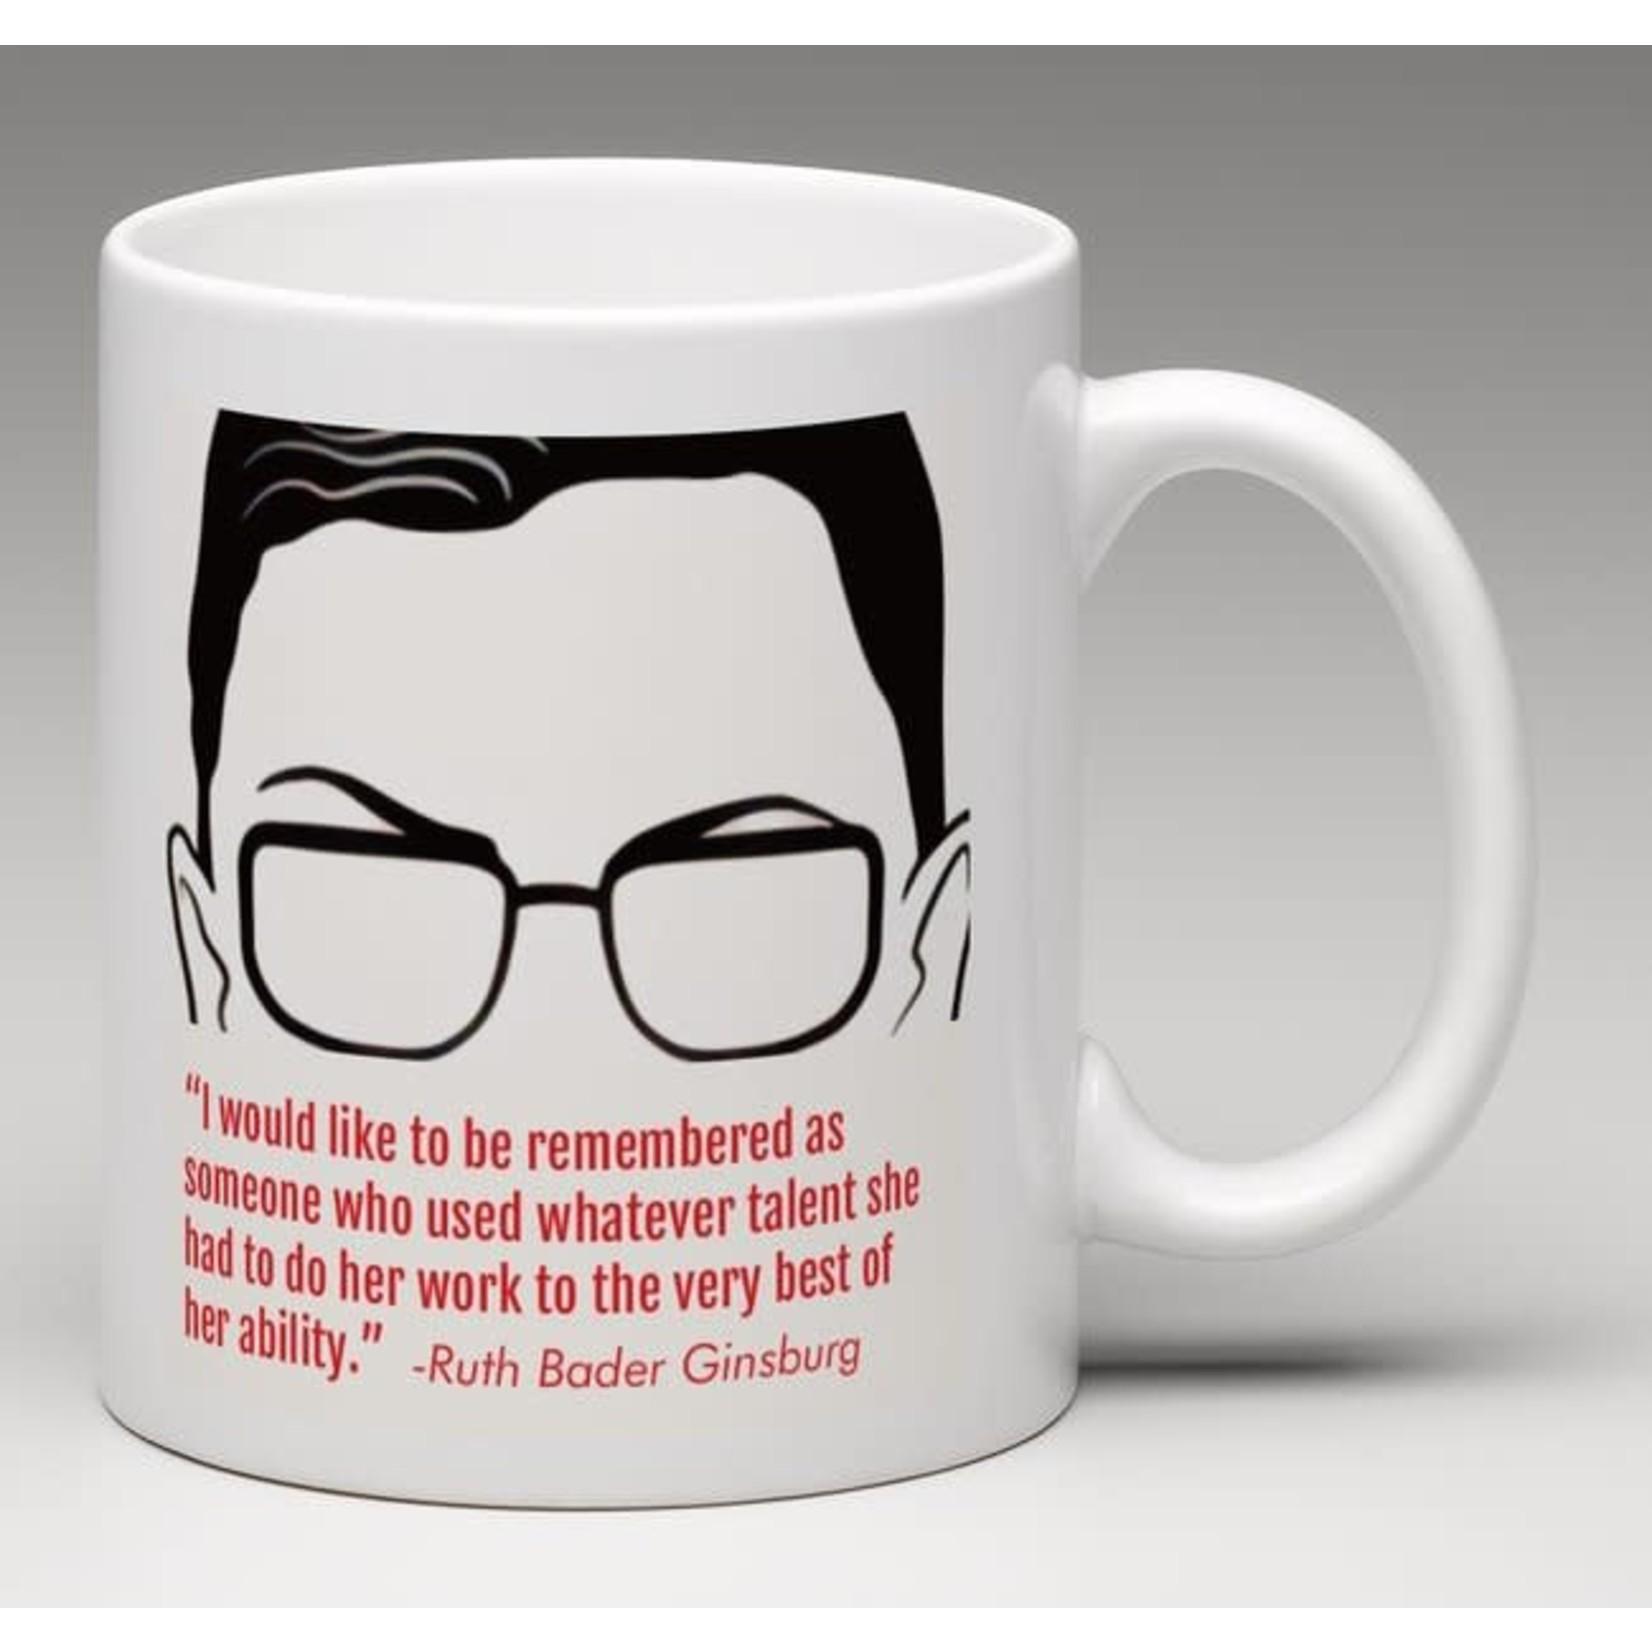 Bad Annie's Mug - Dissent Is Patriotic - Ruth Bader Ginsburg